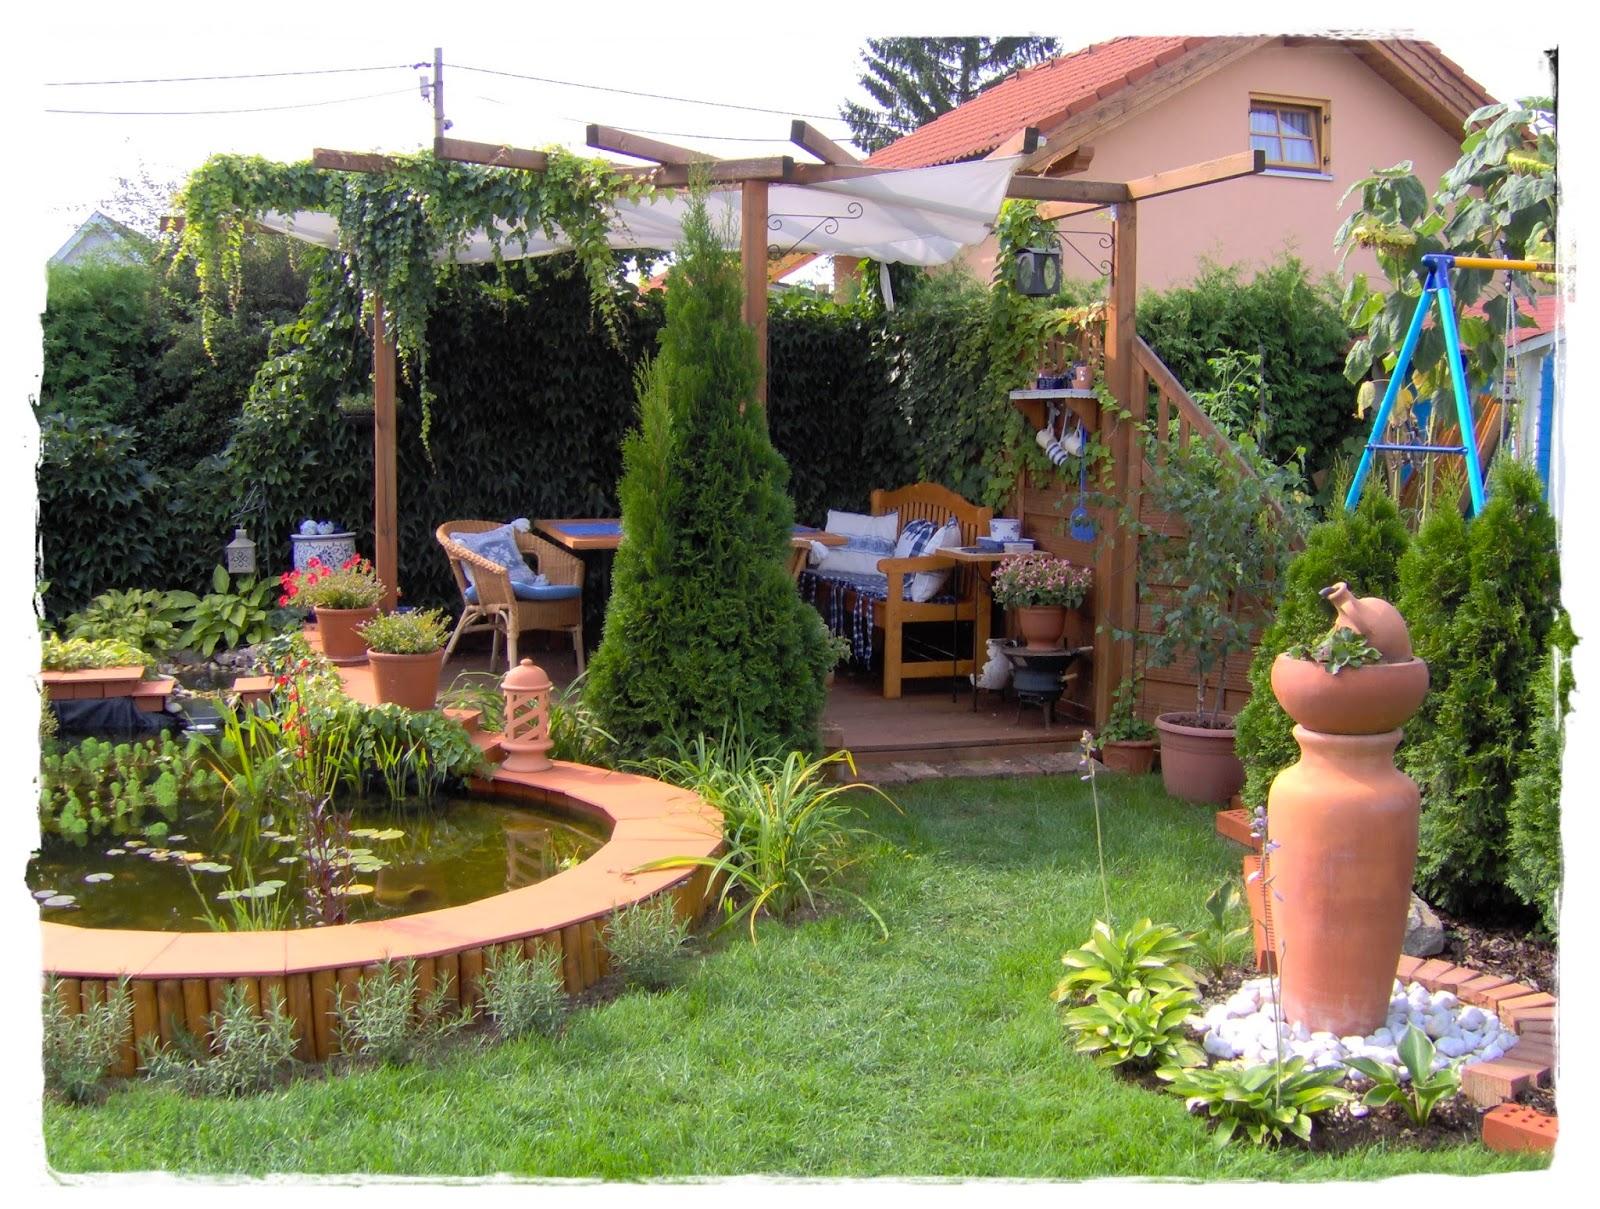 Schön Garten Modern Gestalten Ideen